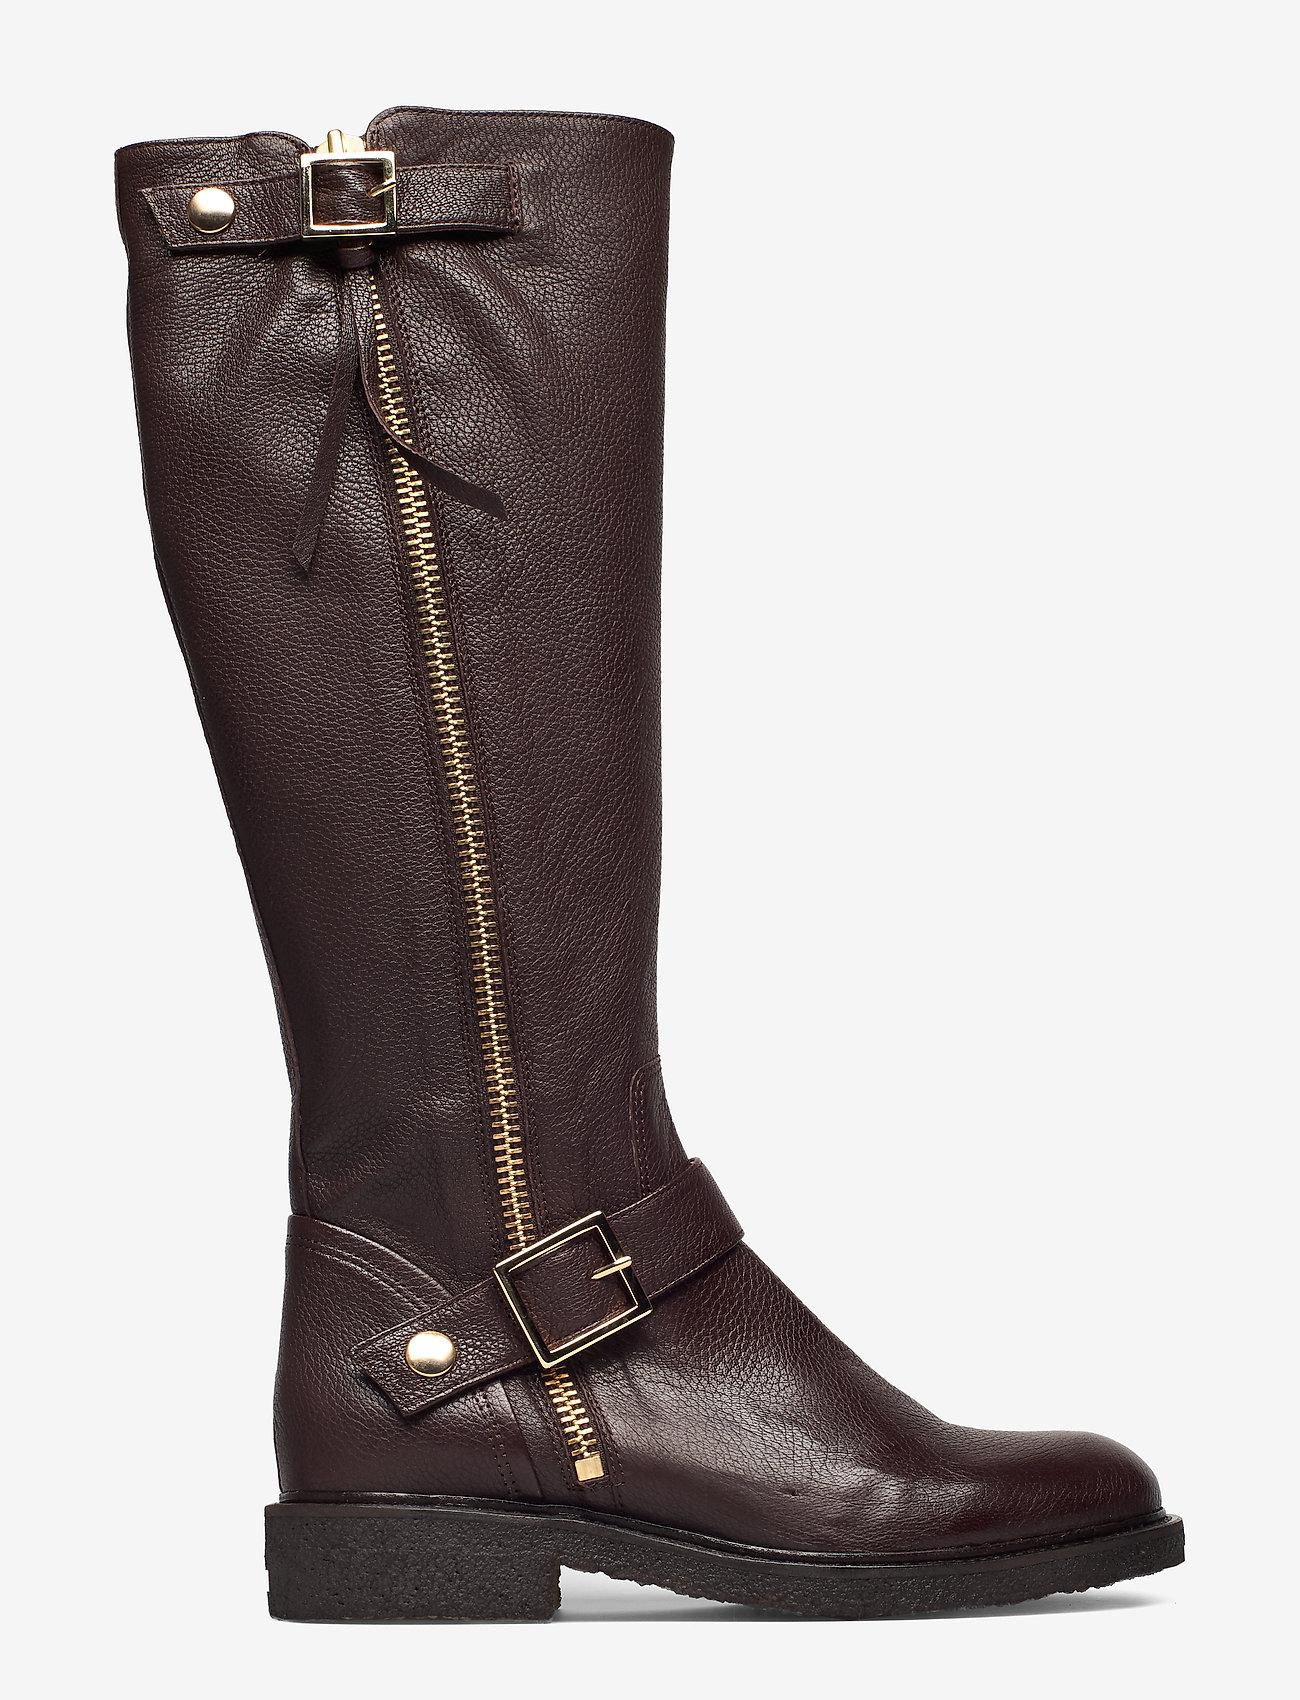 Billi Bi - Long Boots 3534 - pitkävartiset saappaat - t.moro kenya buffalo 852